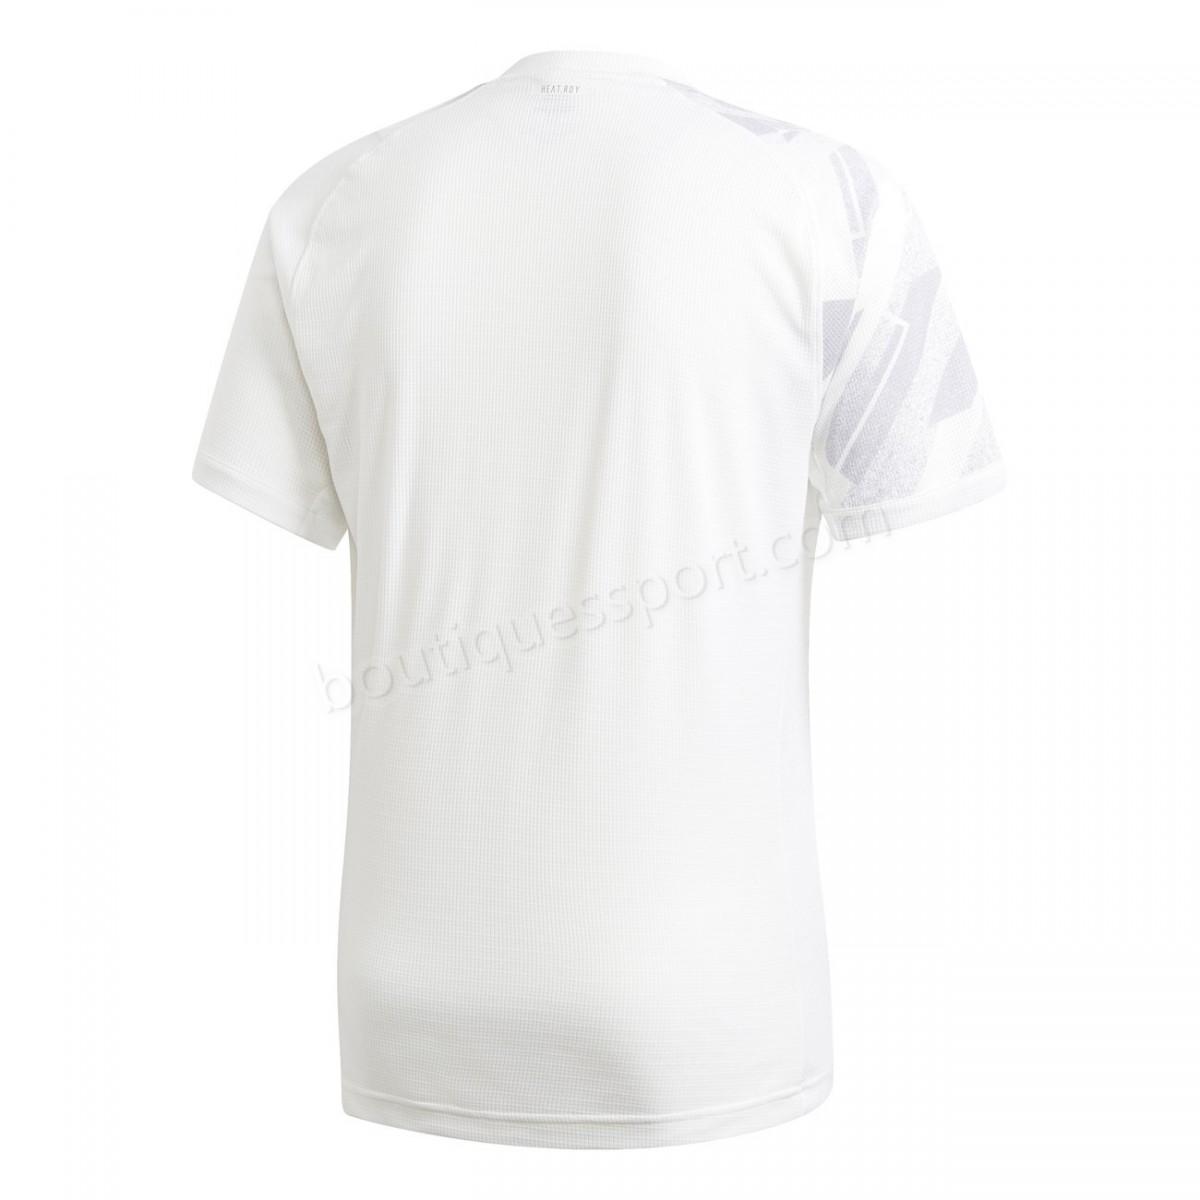 Tennis homme ADIDAS T-shirt adidas Freelift Printed Tennis Soldes - -16